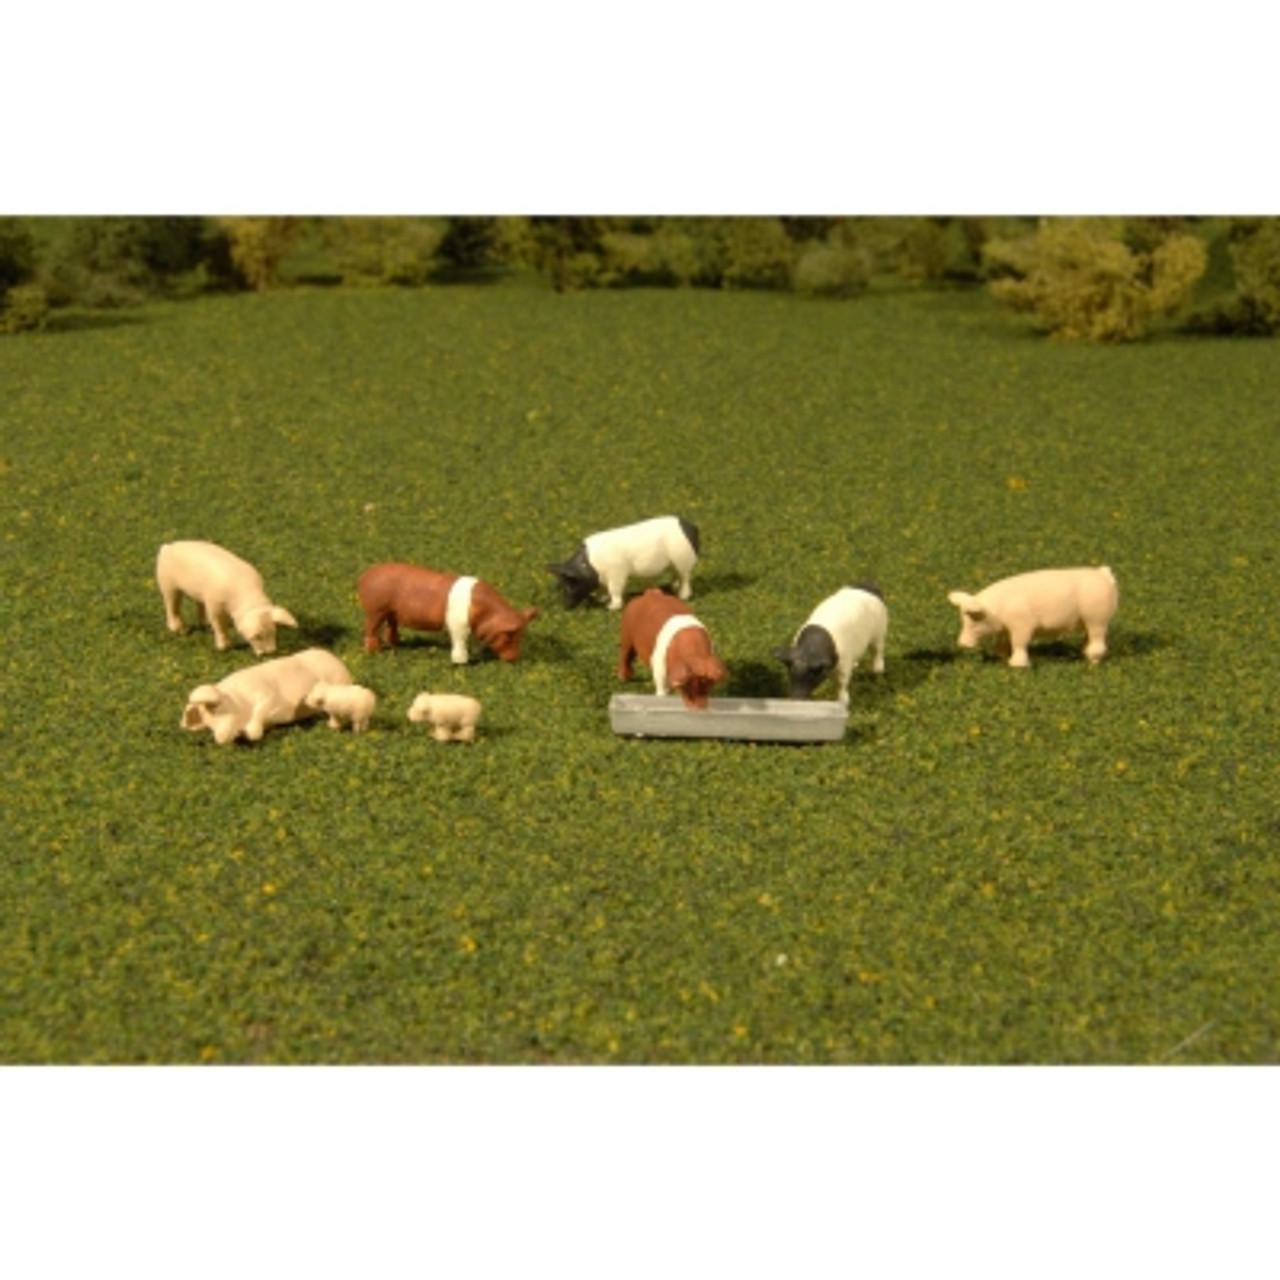 BAC33168  O Pigs (9)